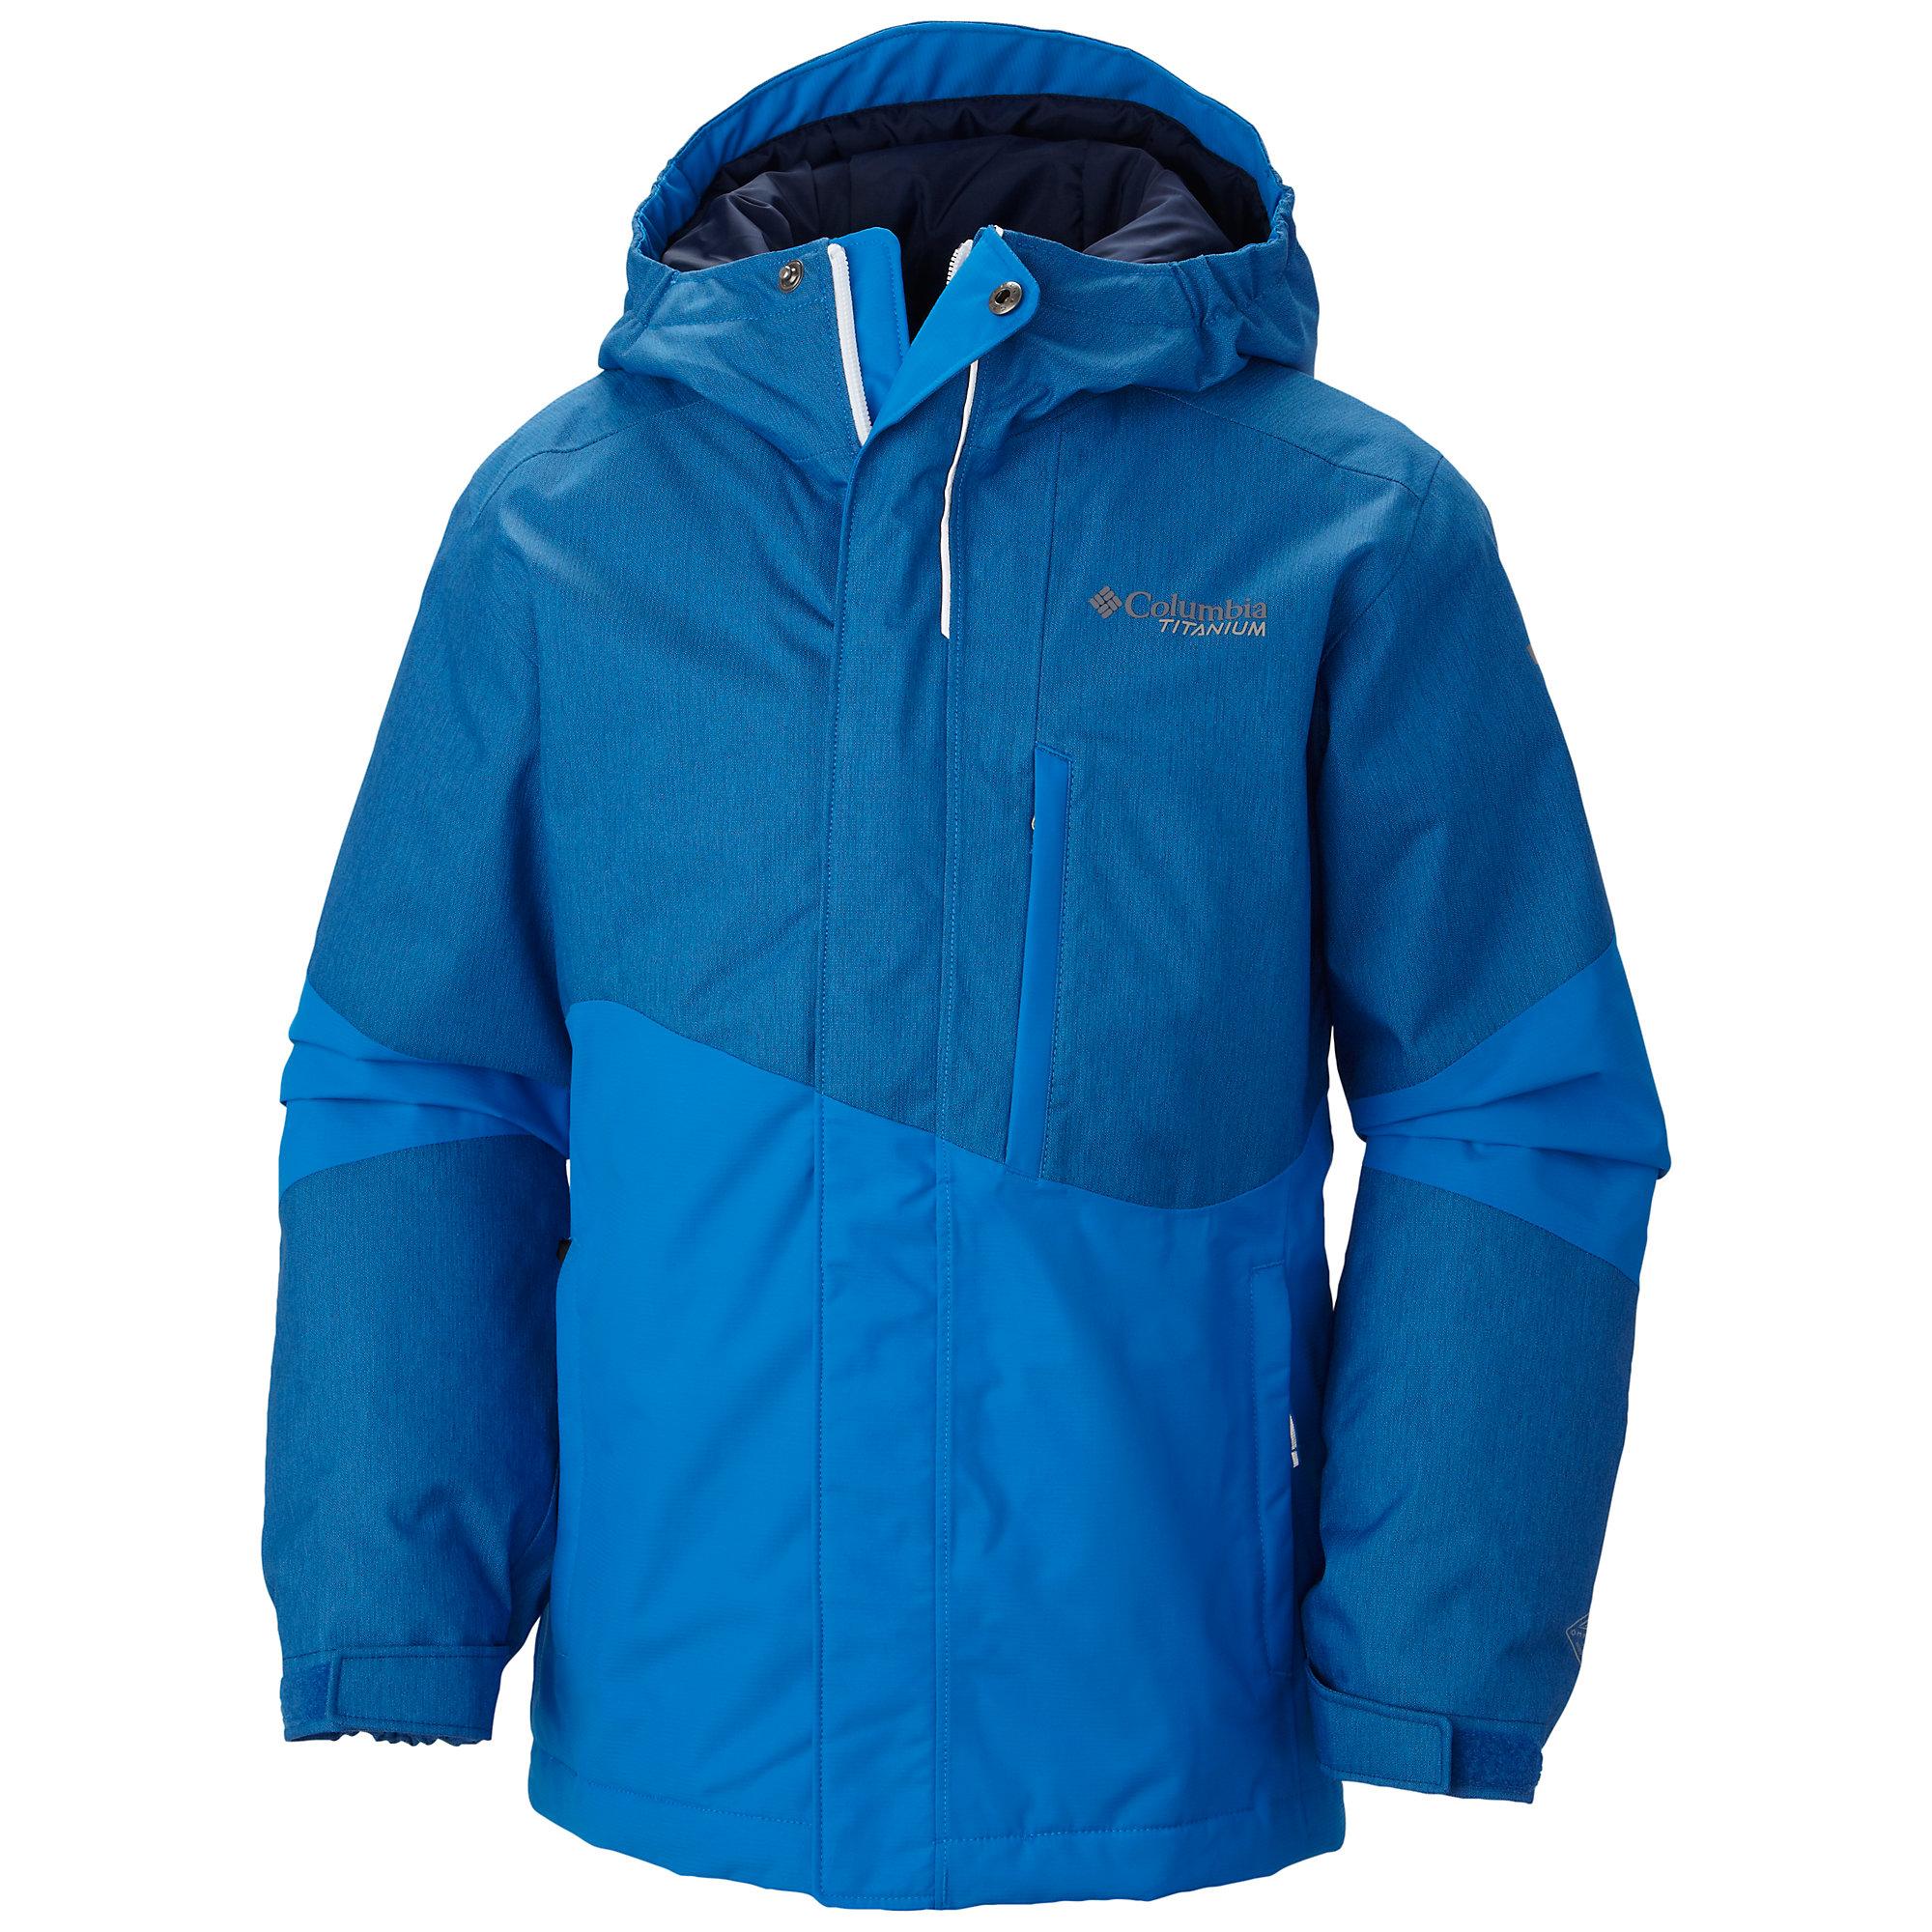 Columbia Shreddin' Jacket